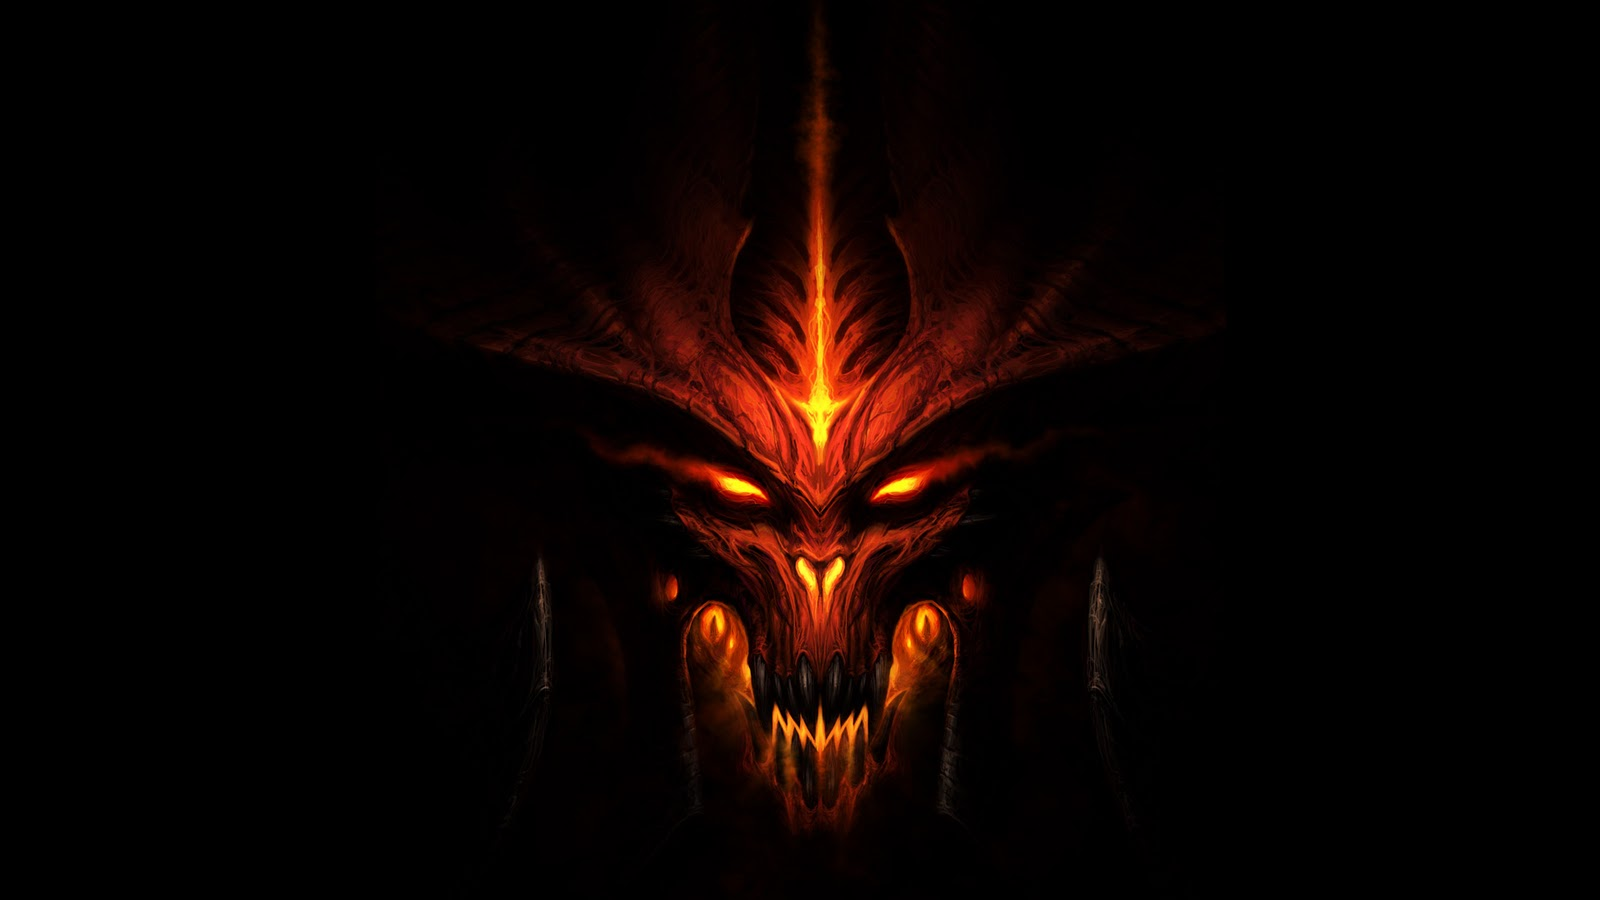 Diablo Poster - Blizzcon 2017, Will Murai on ArtStation at ...  |Diablo Iii Poster